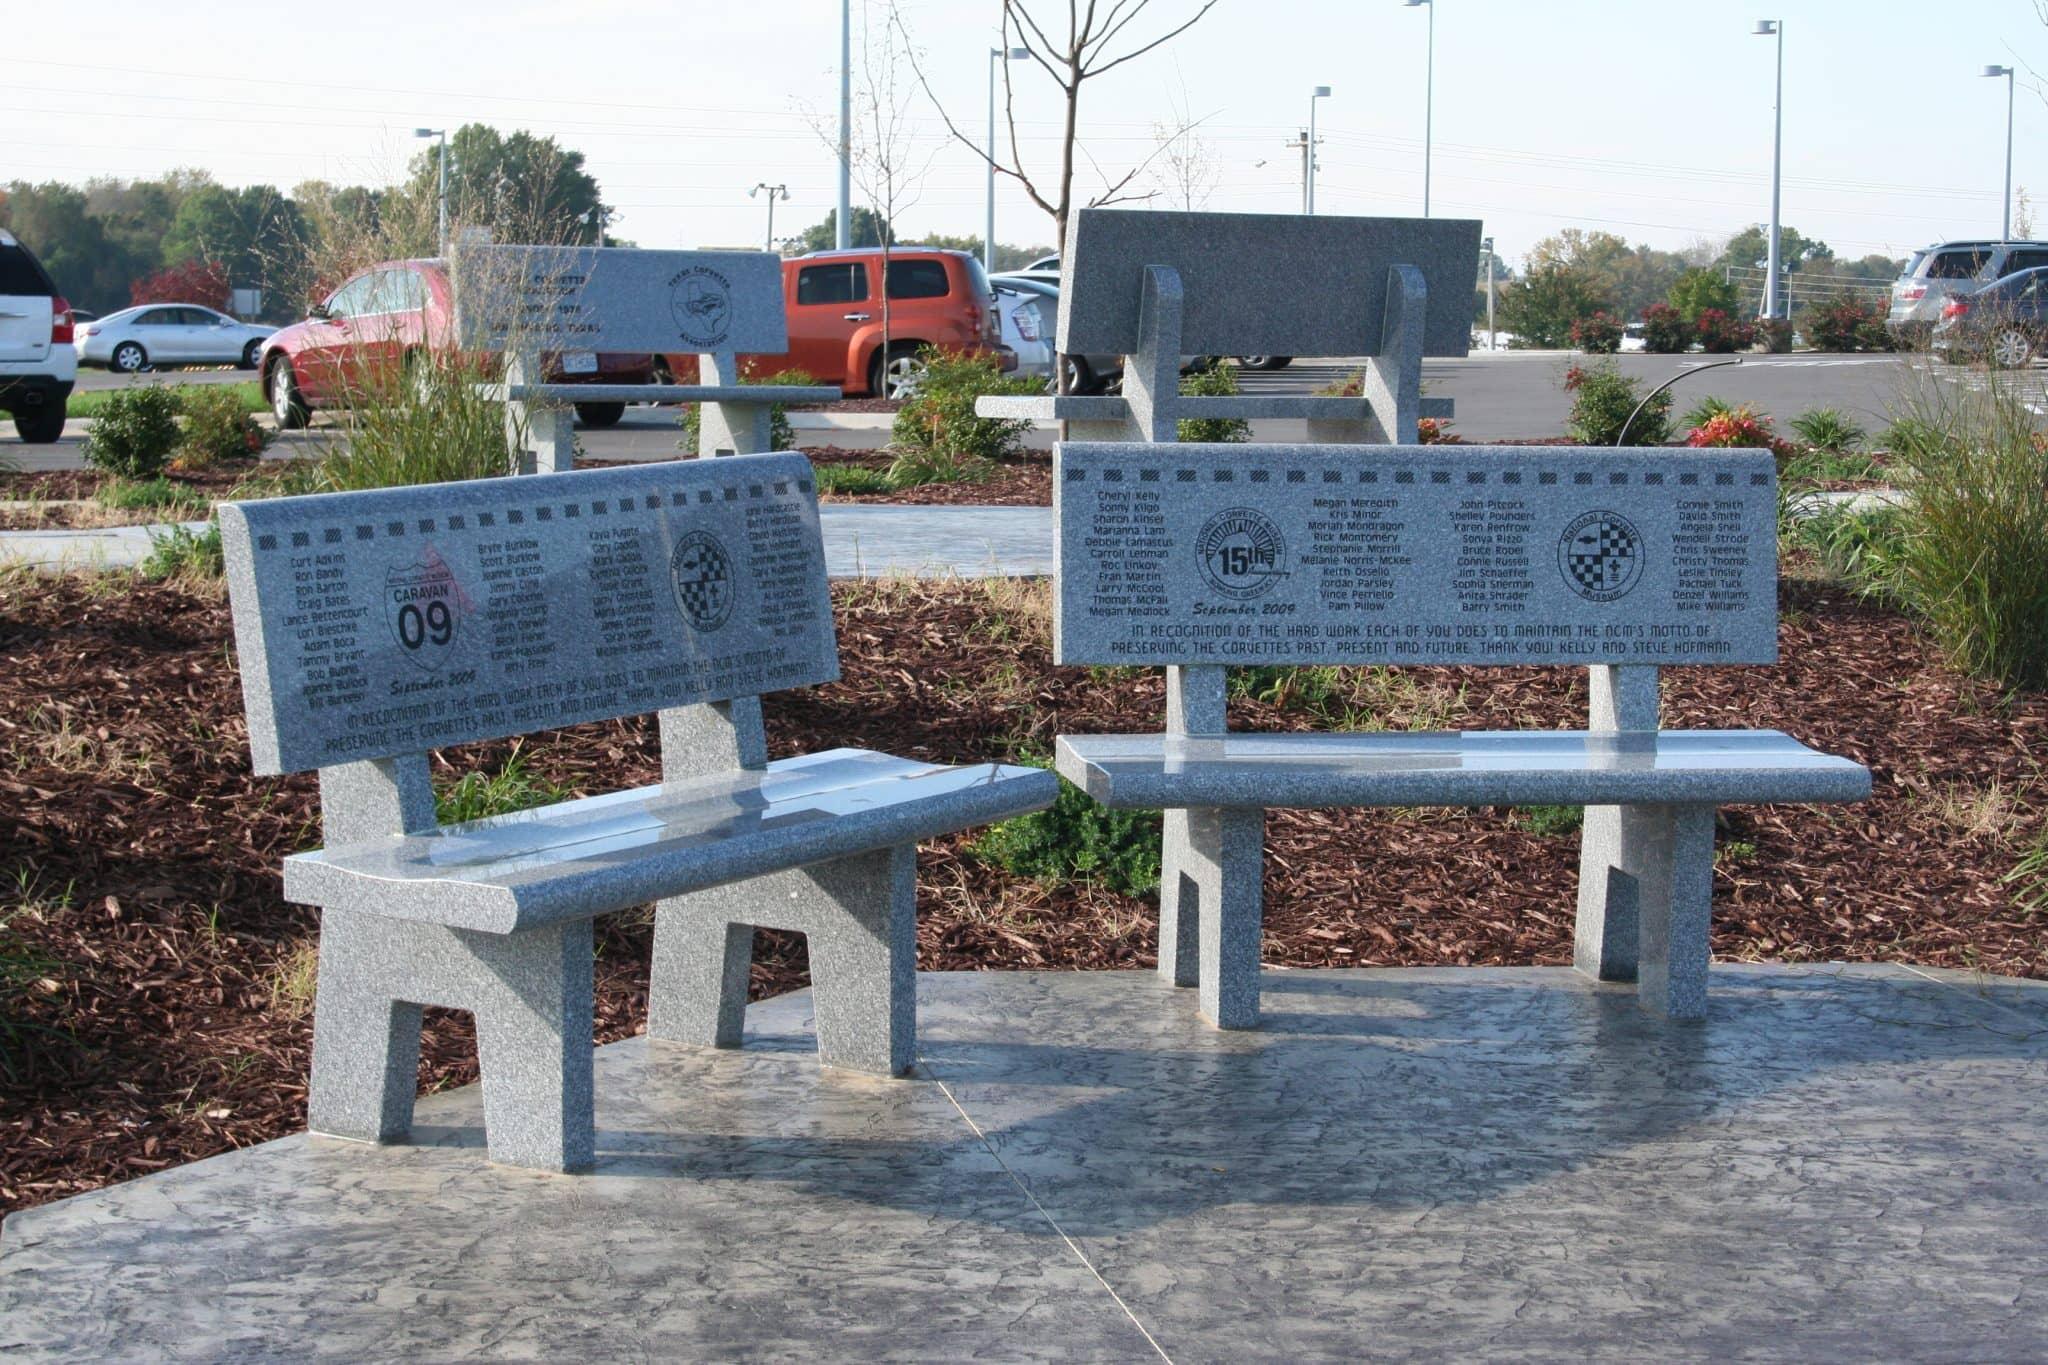 Granite buddy bench